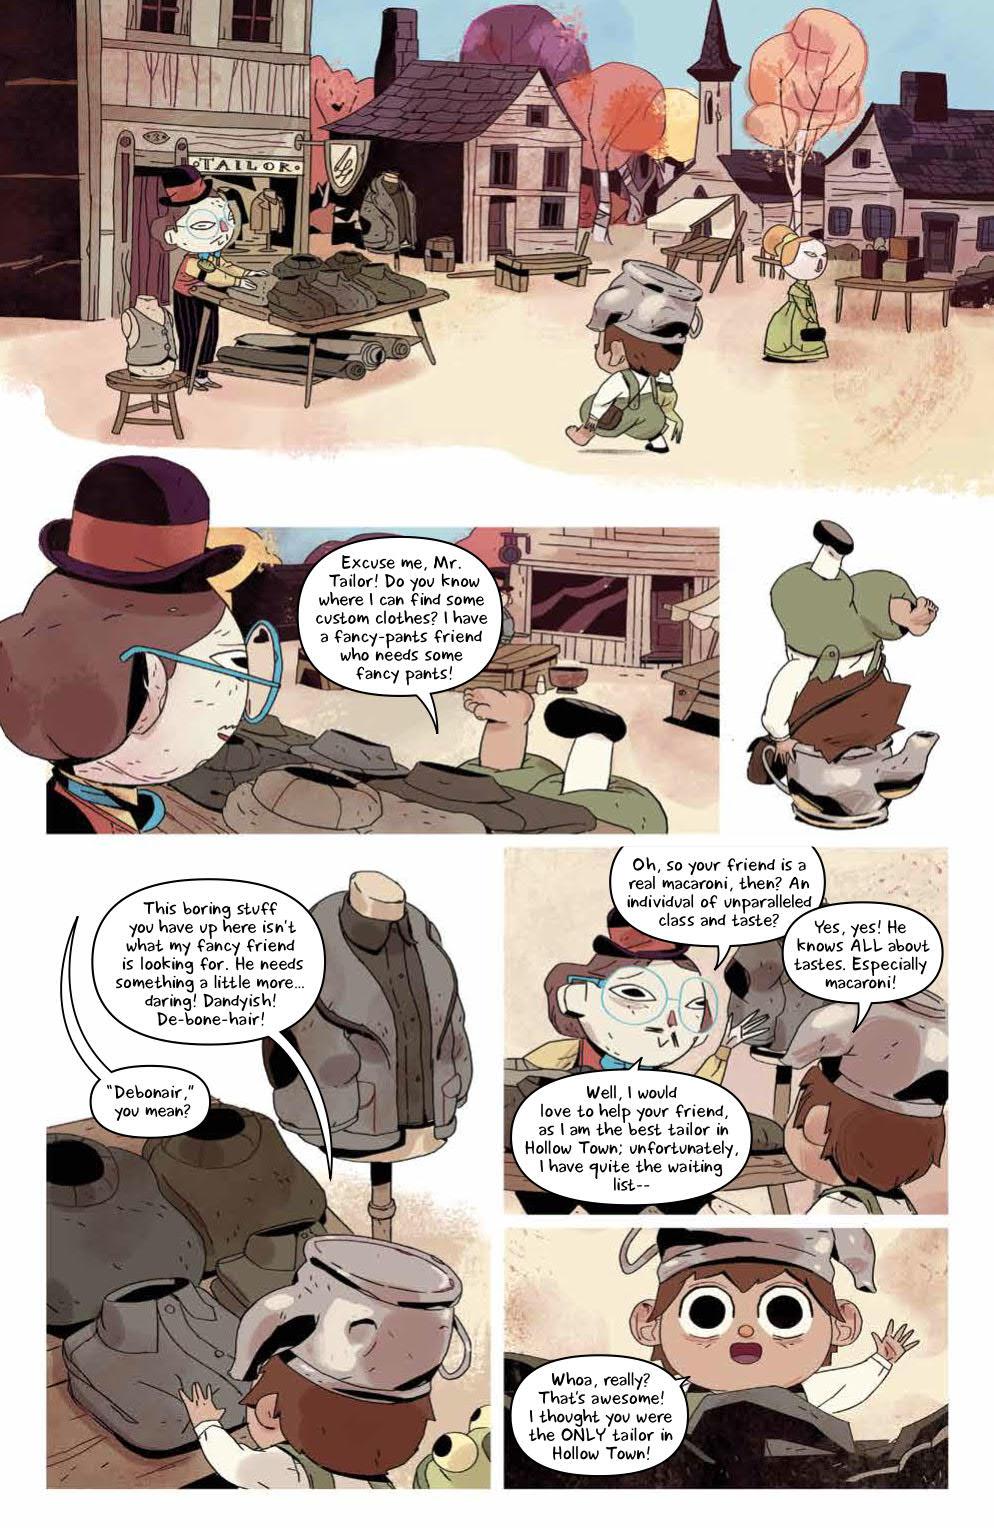 Over the Garden Wall: Hollow Town #2 | Fresh Comics